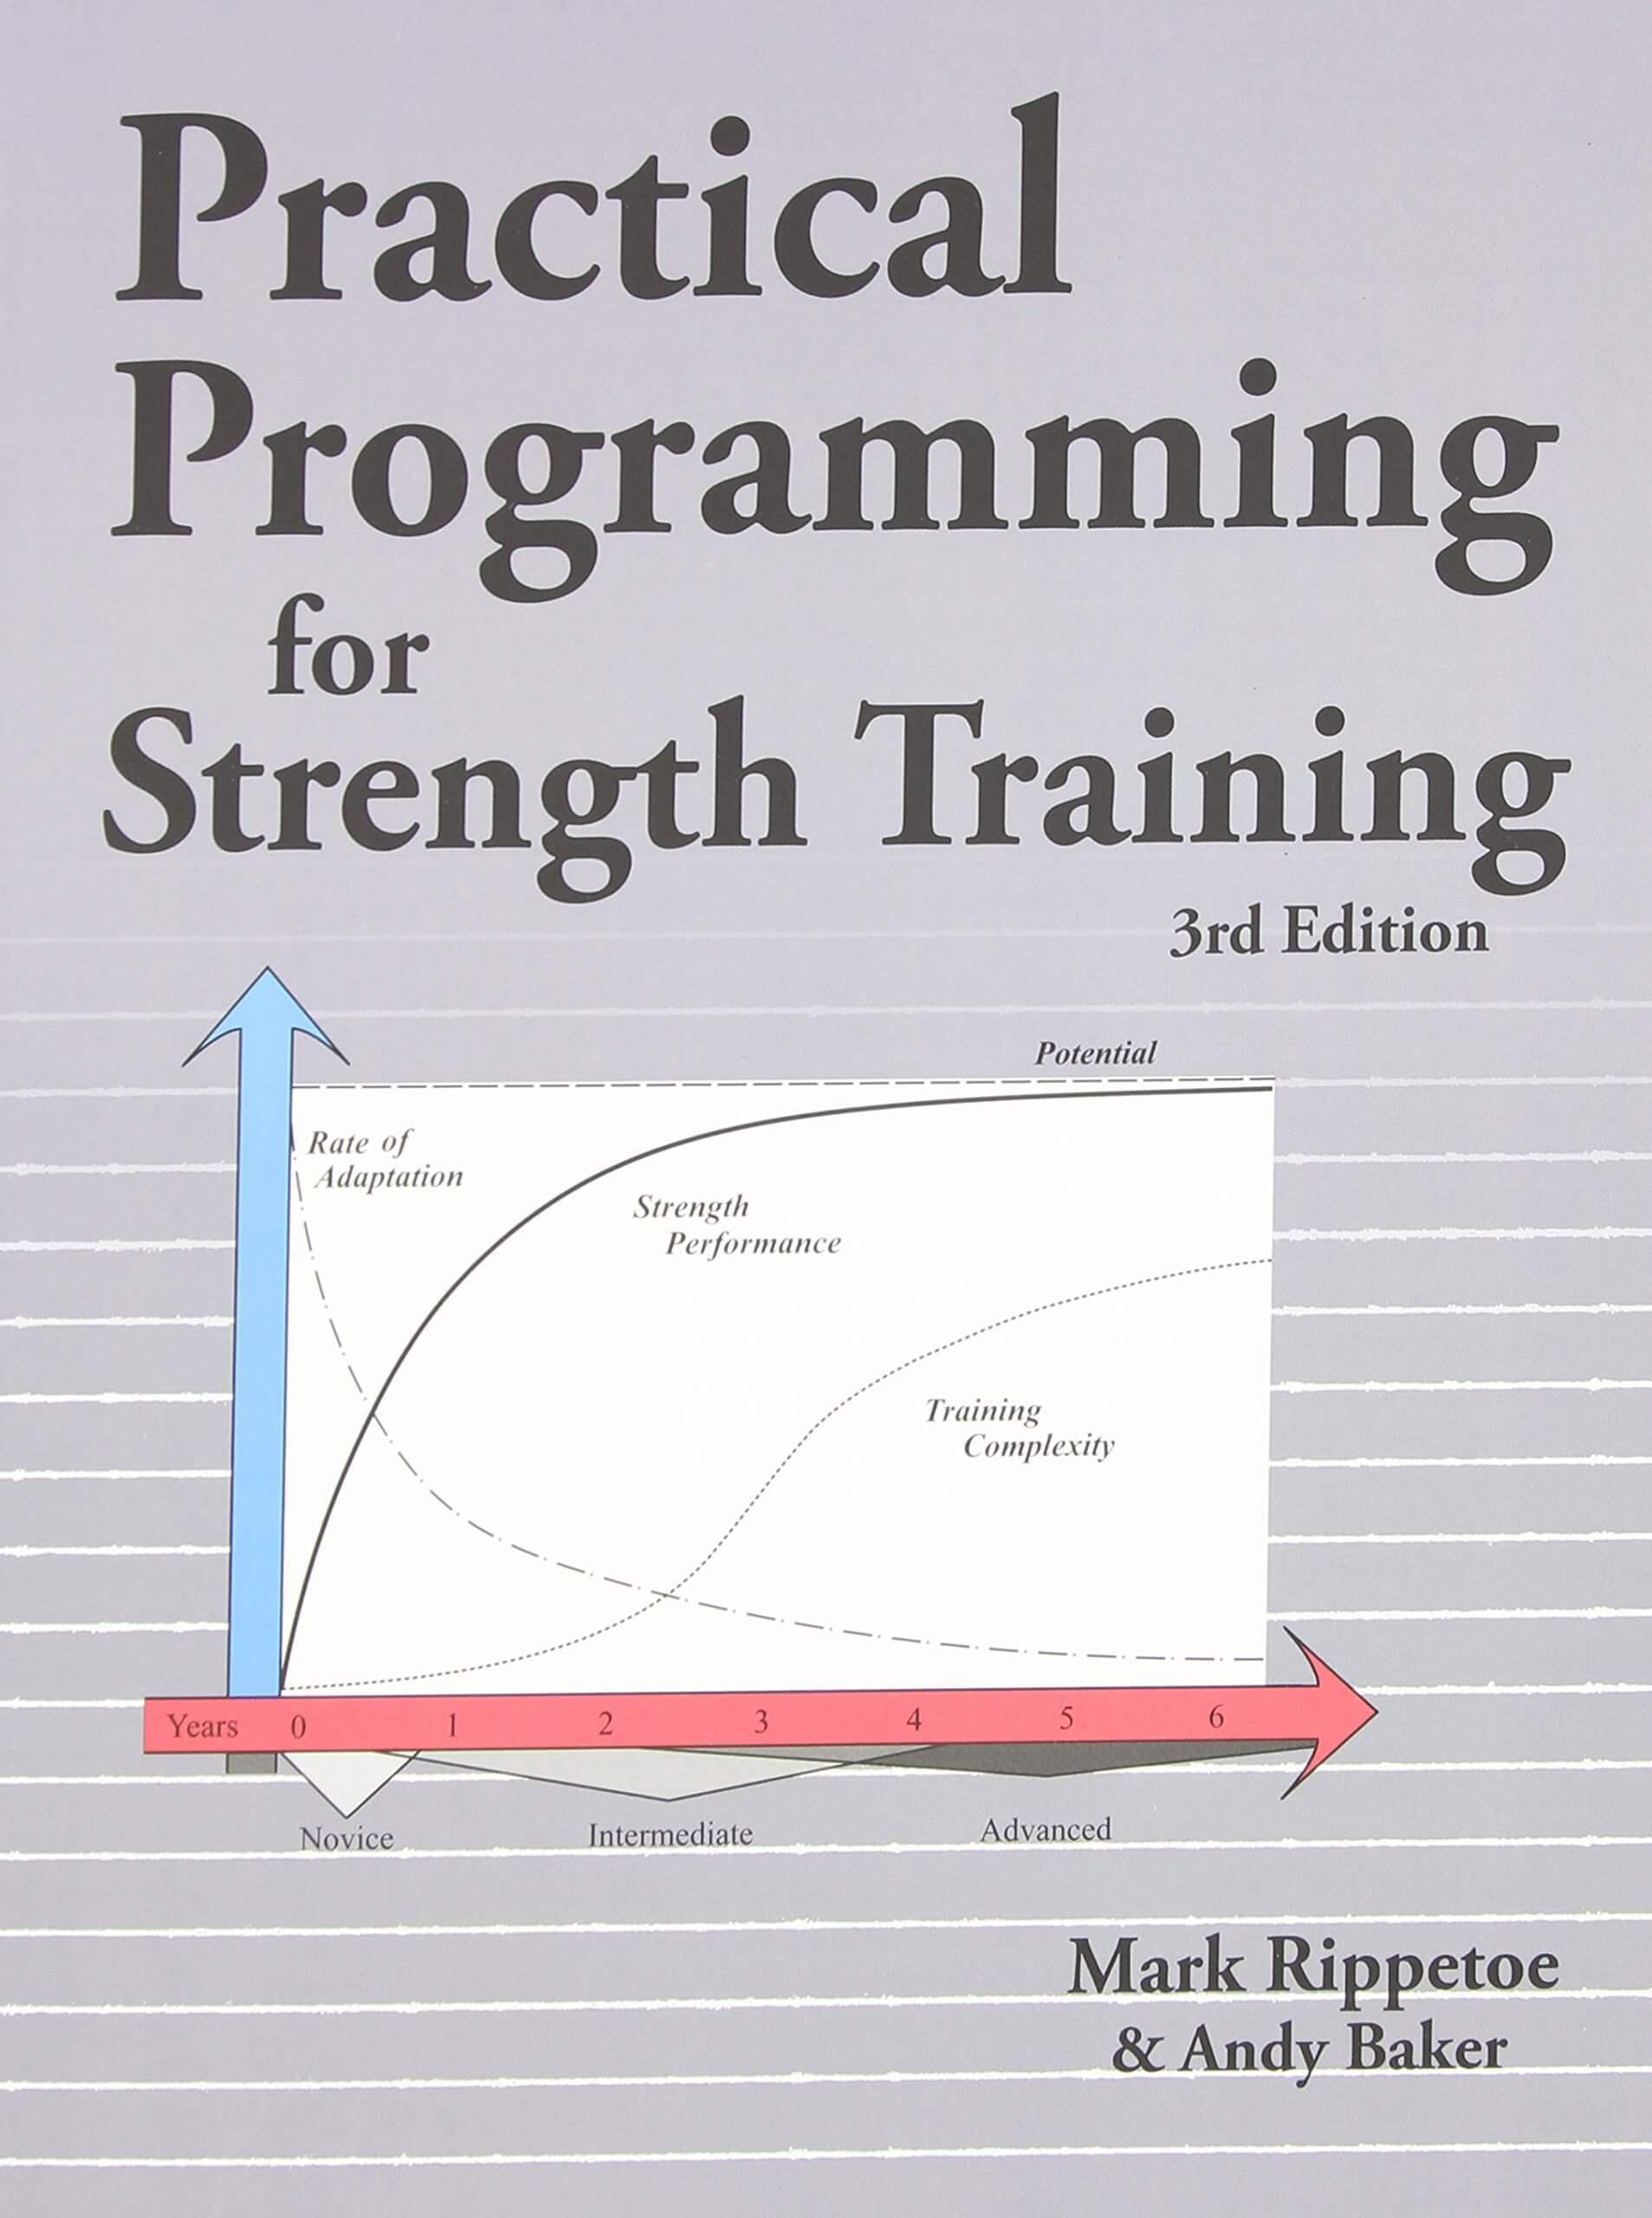 Practical Programming for Strength Training - Mark Rippetoe & Andy Baker, July 2021